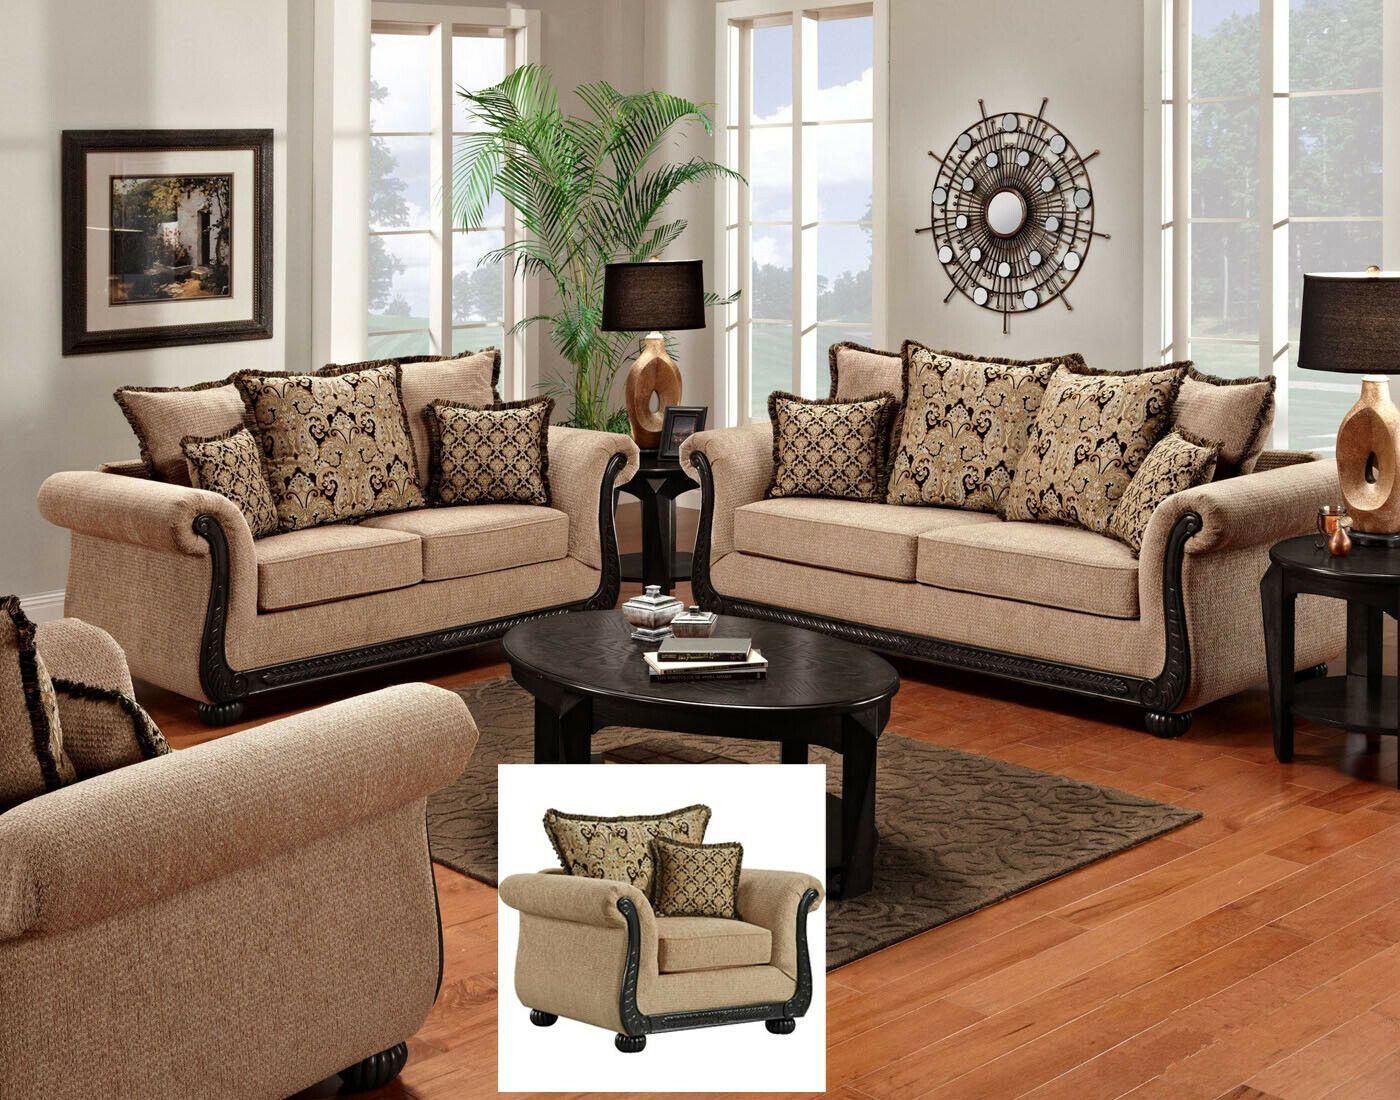 Traditional Sofa Living Room Sets Furniture Cheap Living Room Furniture Cheap Living Room Sets Picture sets for living room